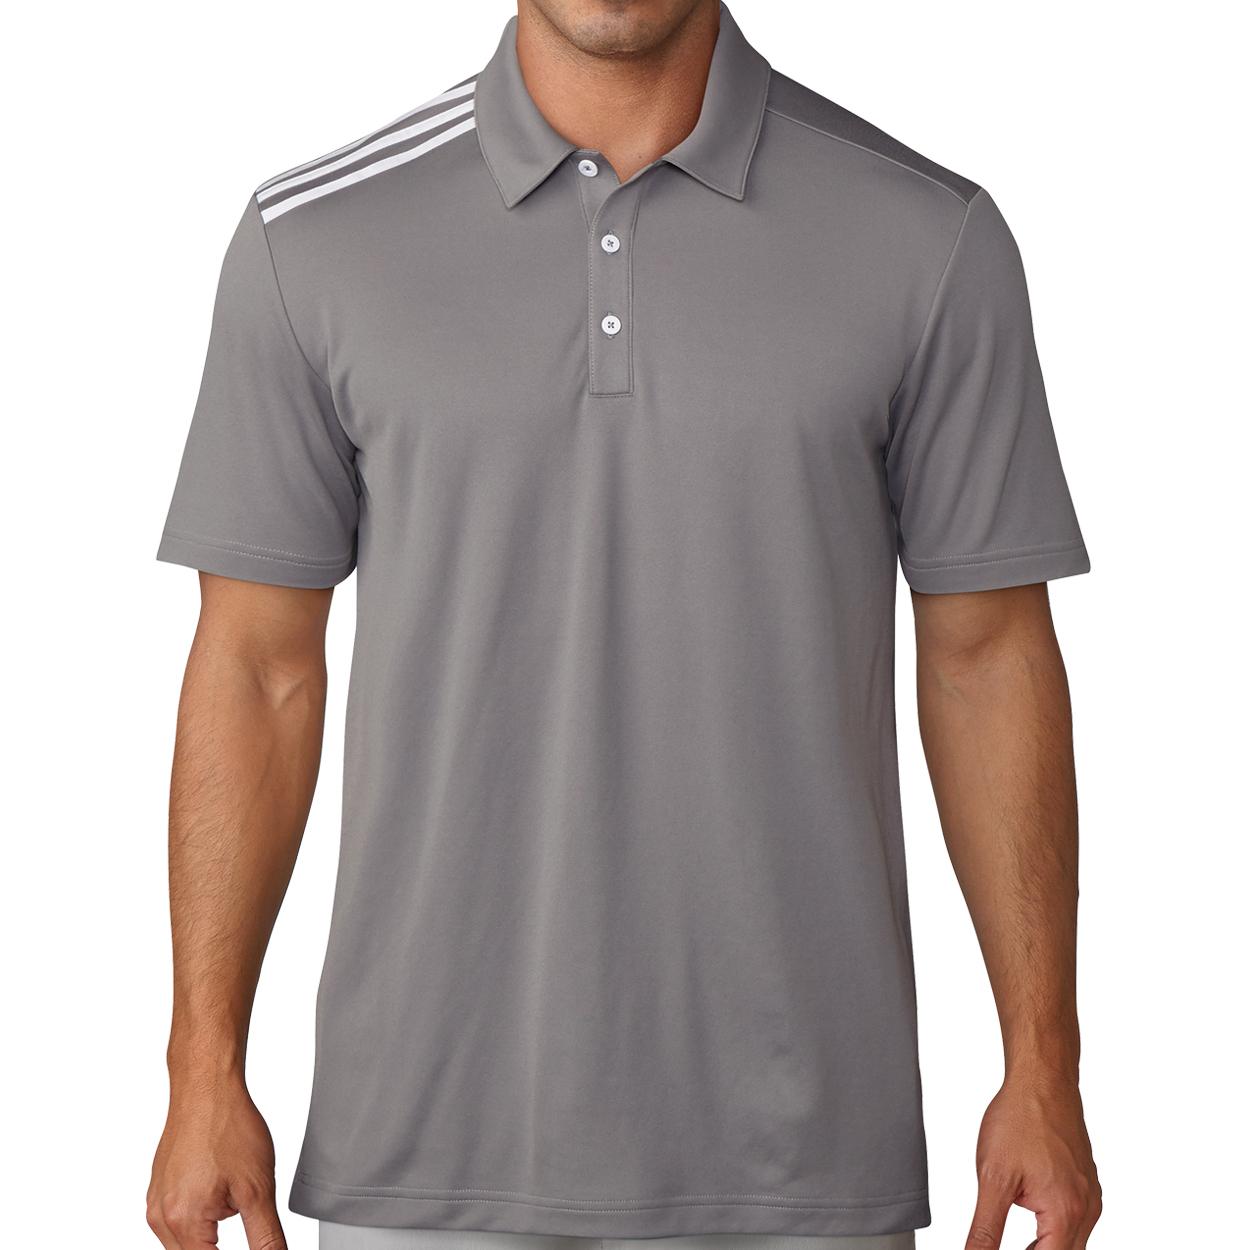 brand new 7df1c 943d9 Adidas Golf Men s Essential 3 Stripe Shirt